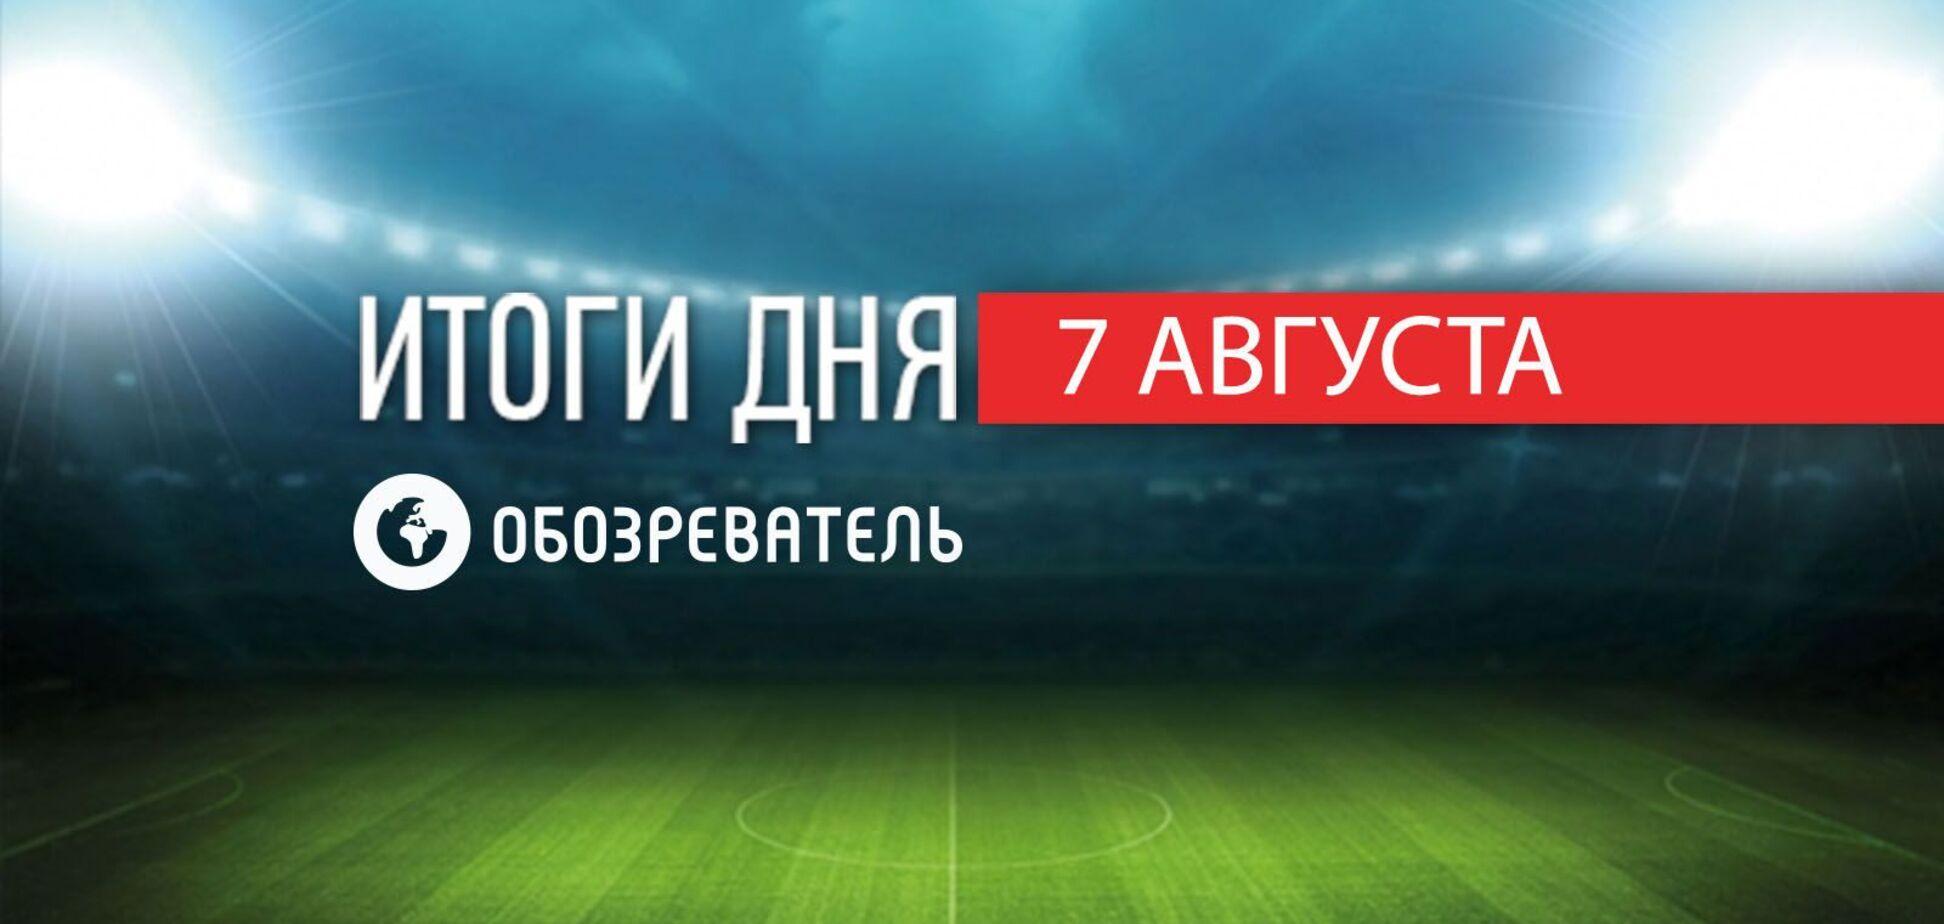 Футболиста 'Шахтера' затравили из-за девушки: спортивные итоги 7 августа